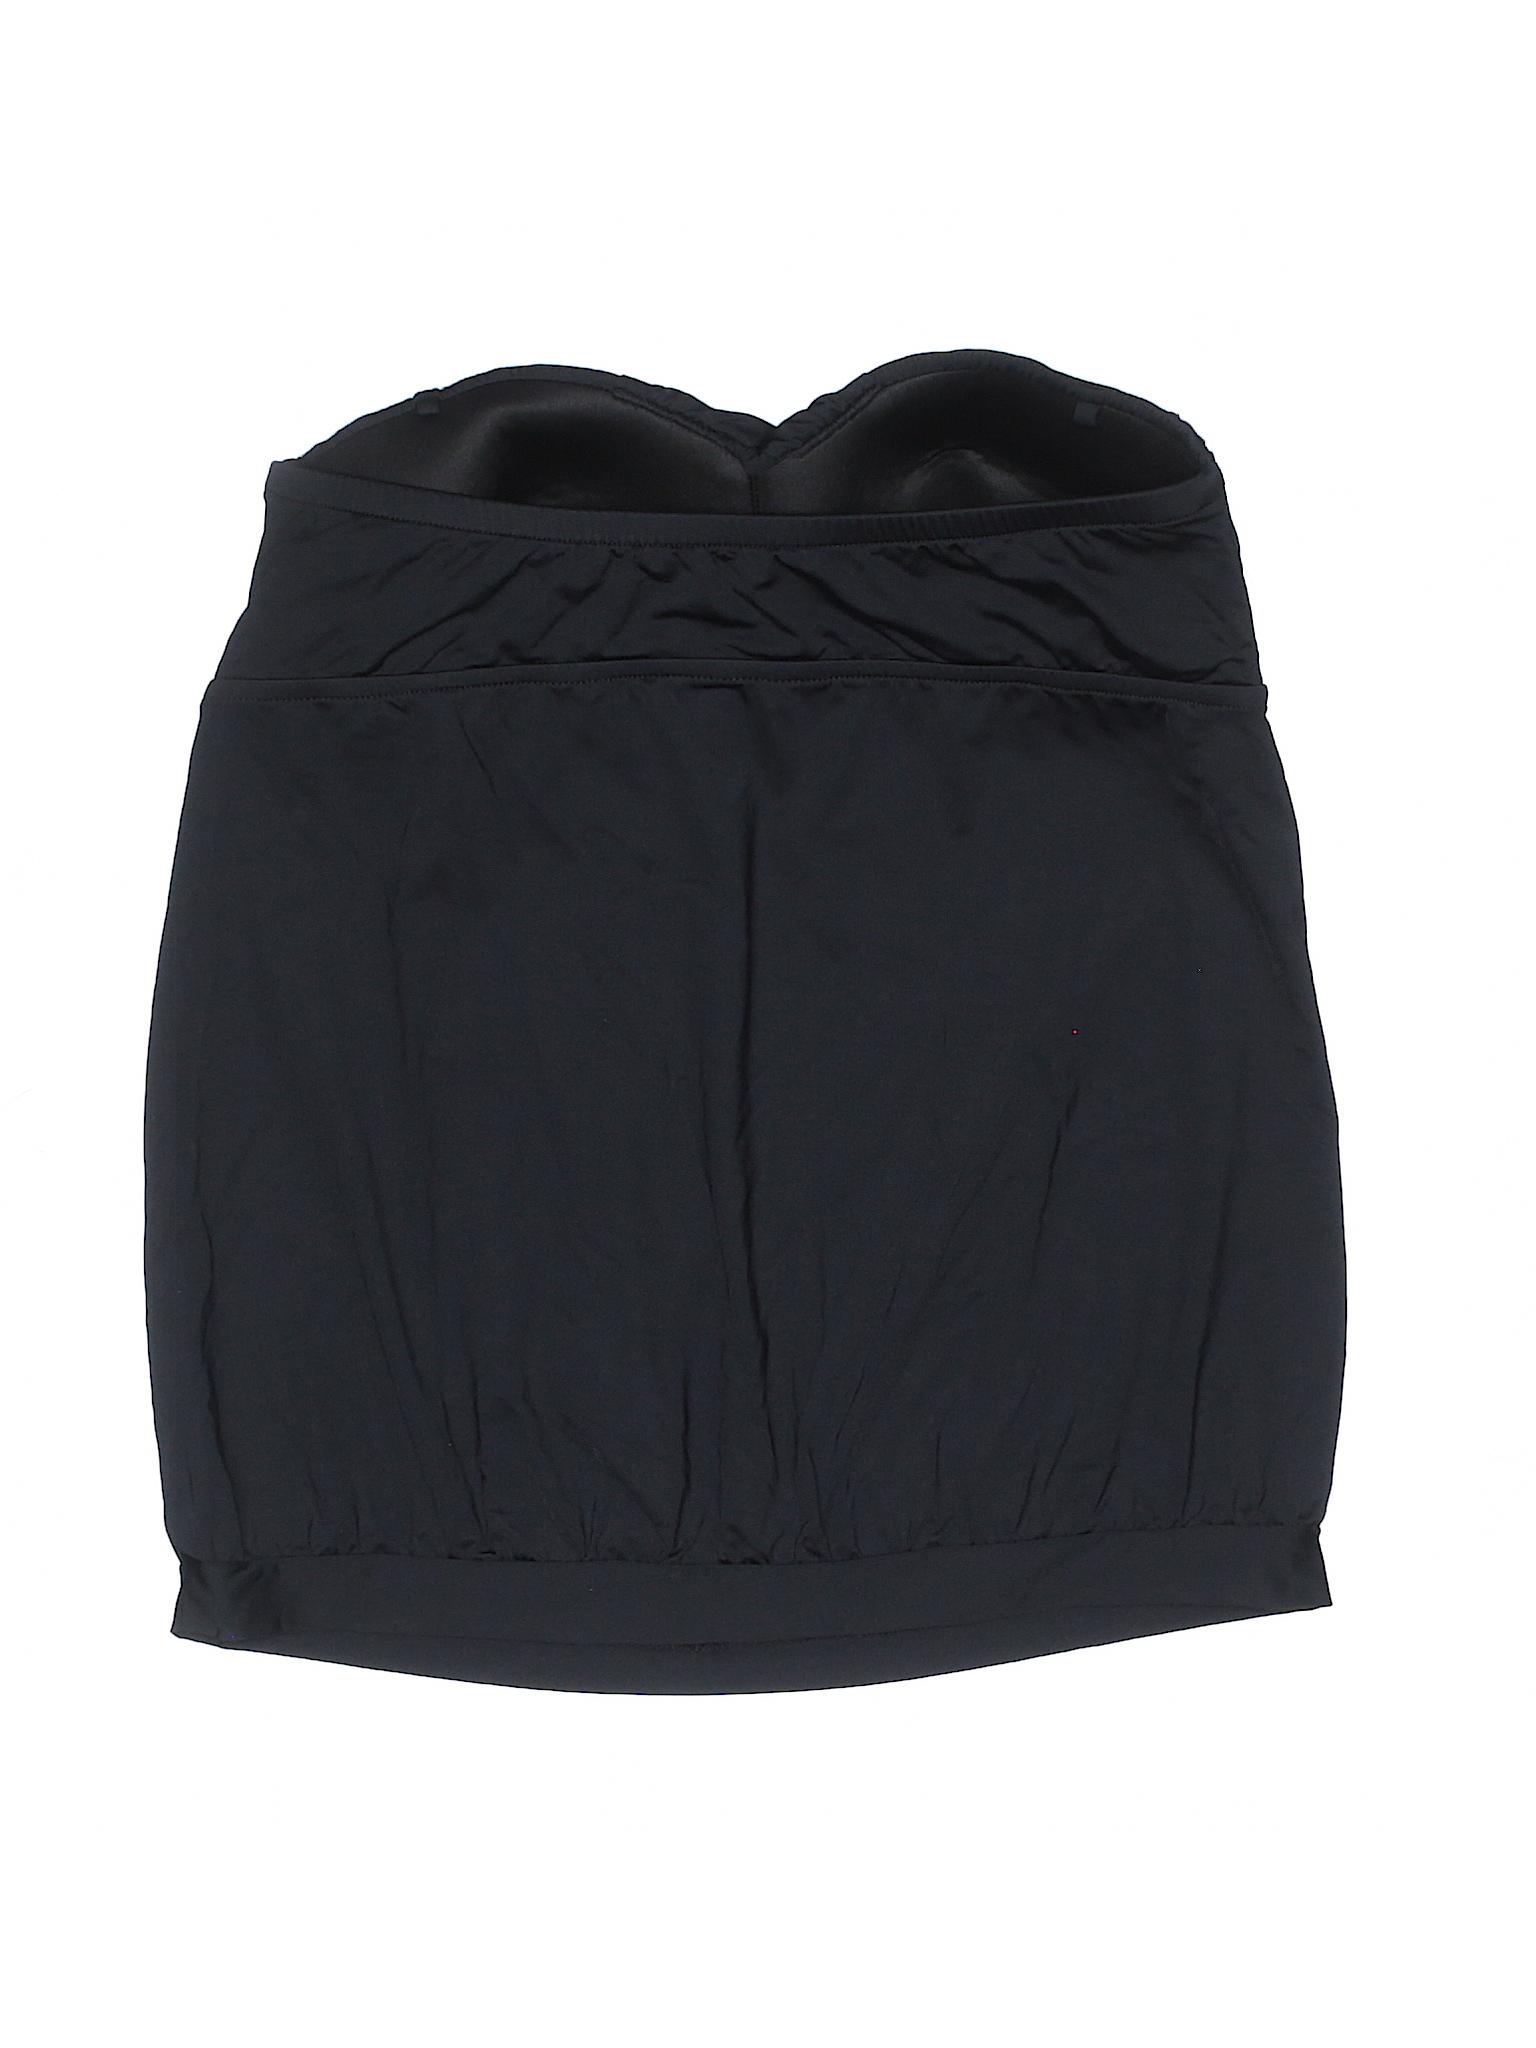 Badgley Boutique Mischka Boutique Badgley Top Swimsuit BU4Bqrxd